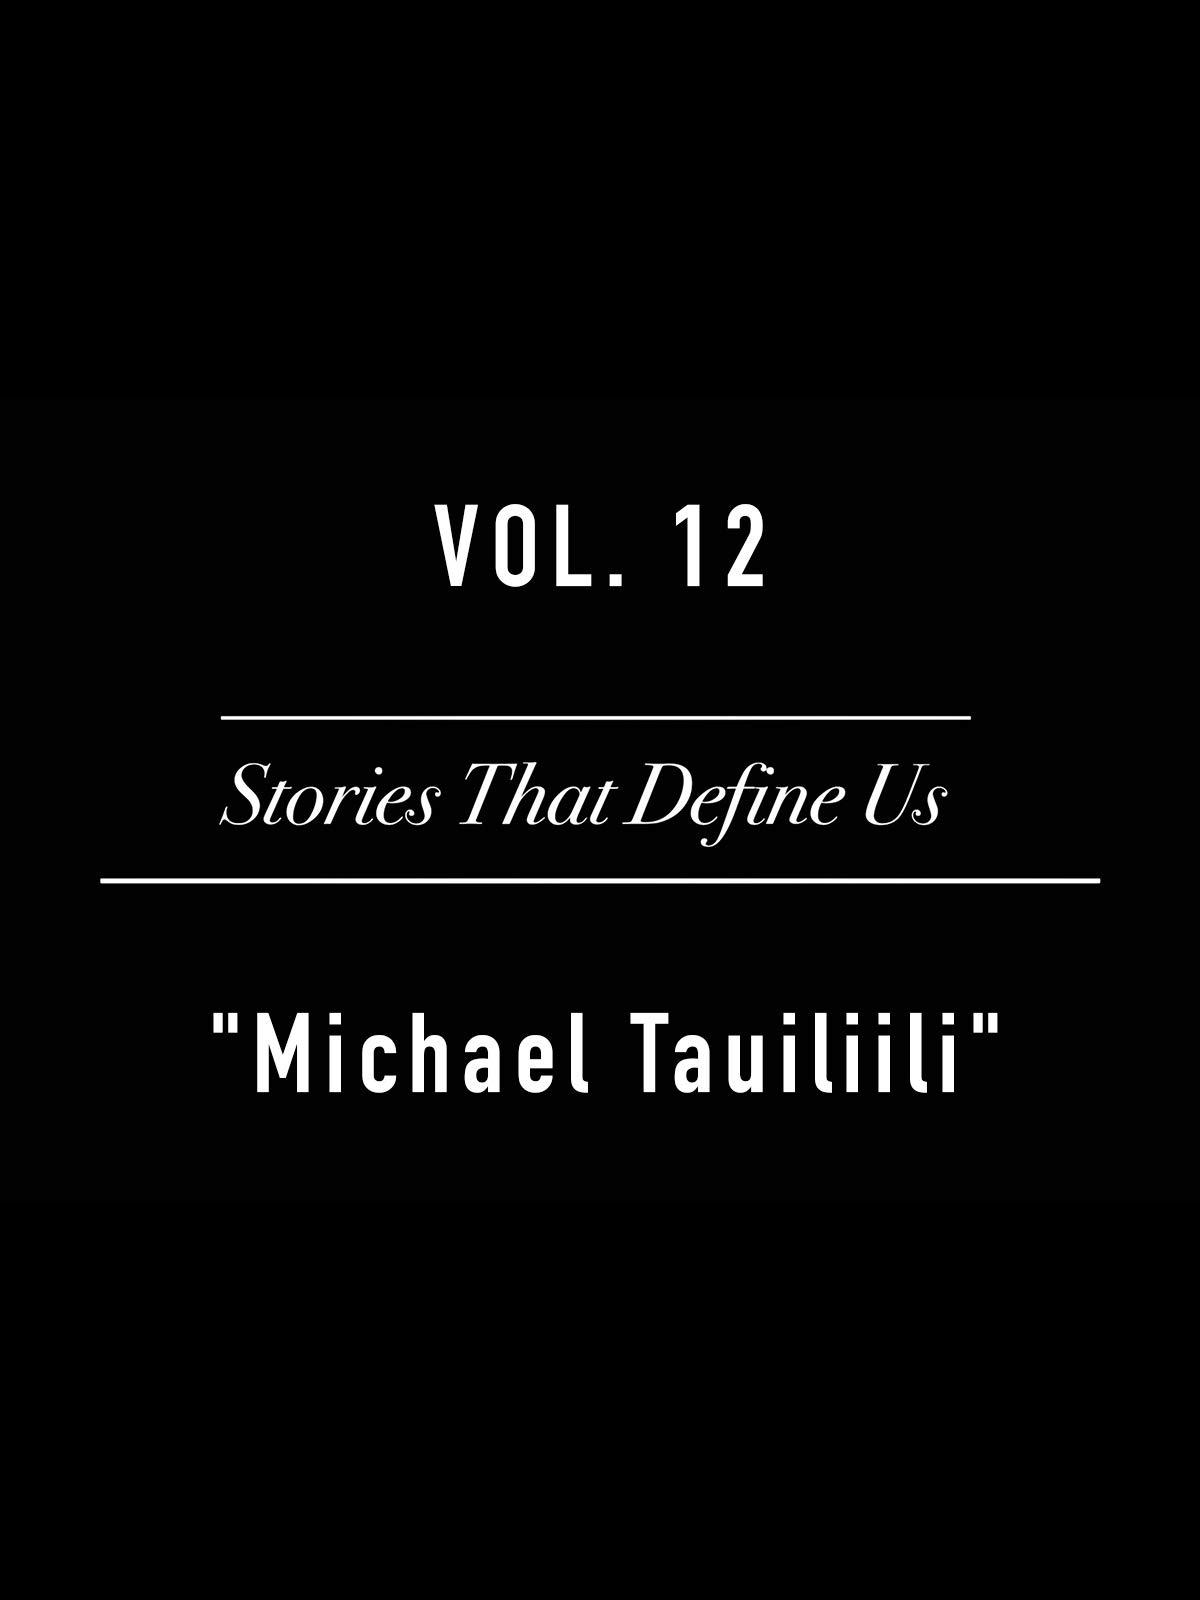 Stories That Define Us Vol. 12